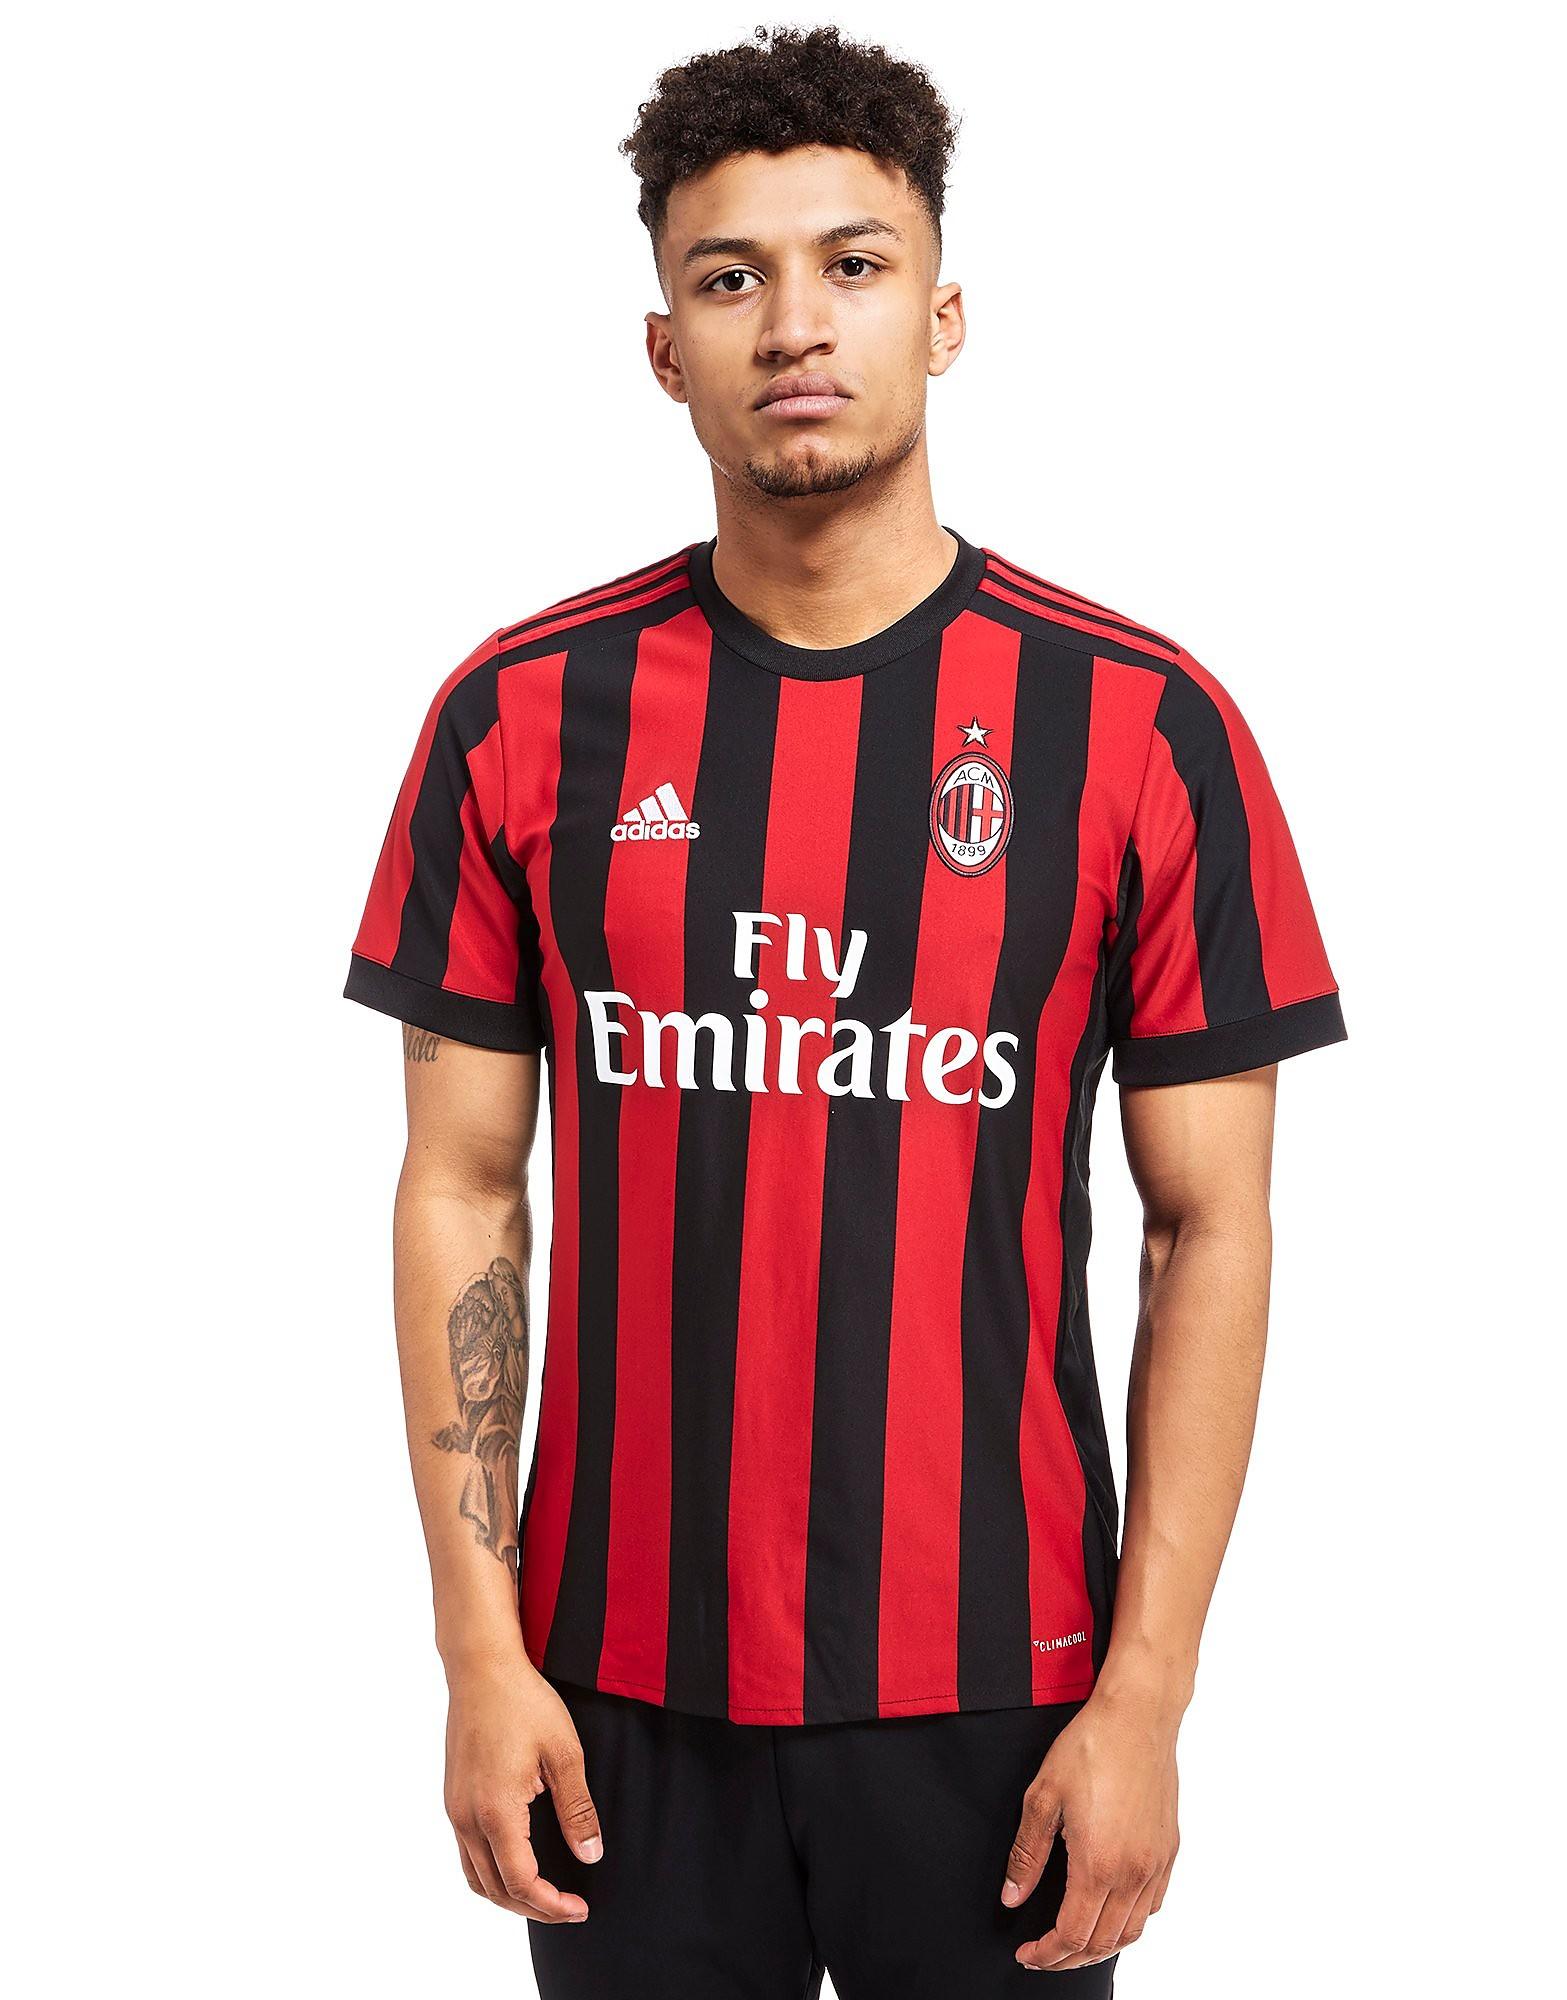 adidas AC Milan 2017/18 Home Shirt